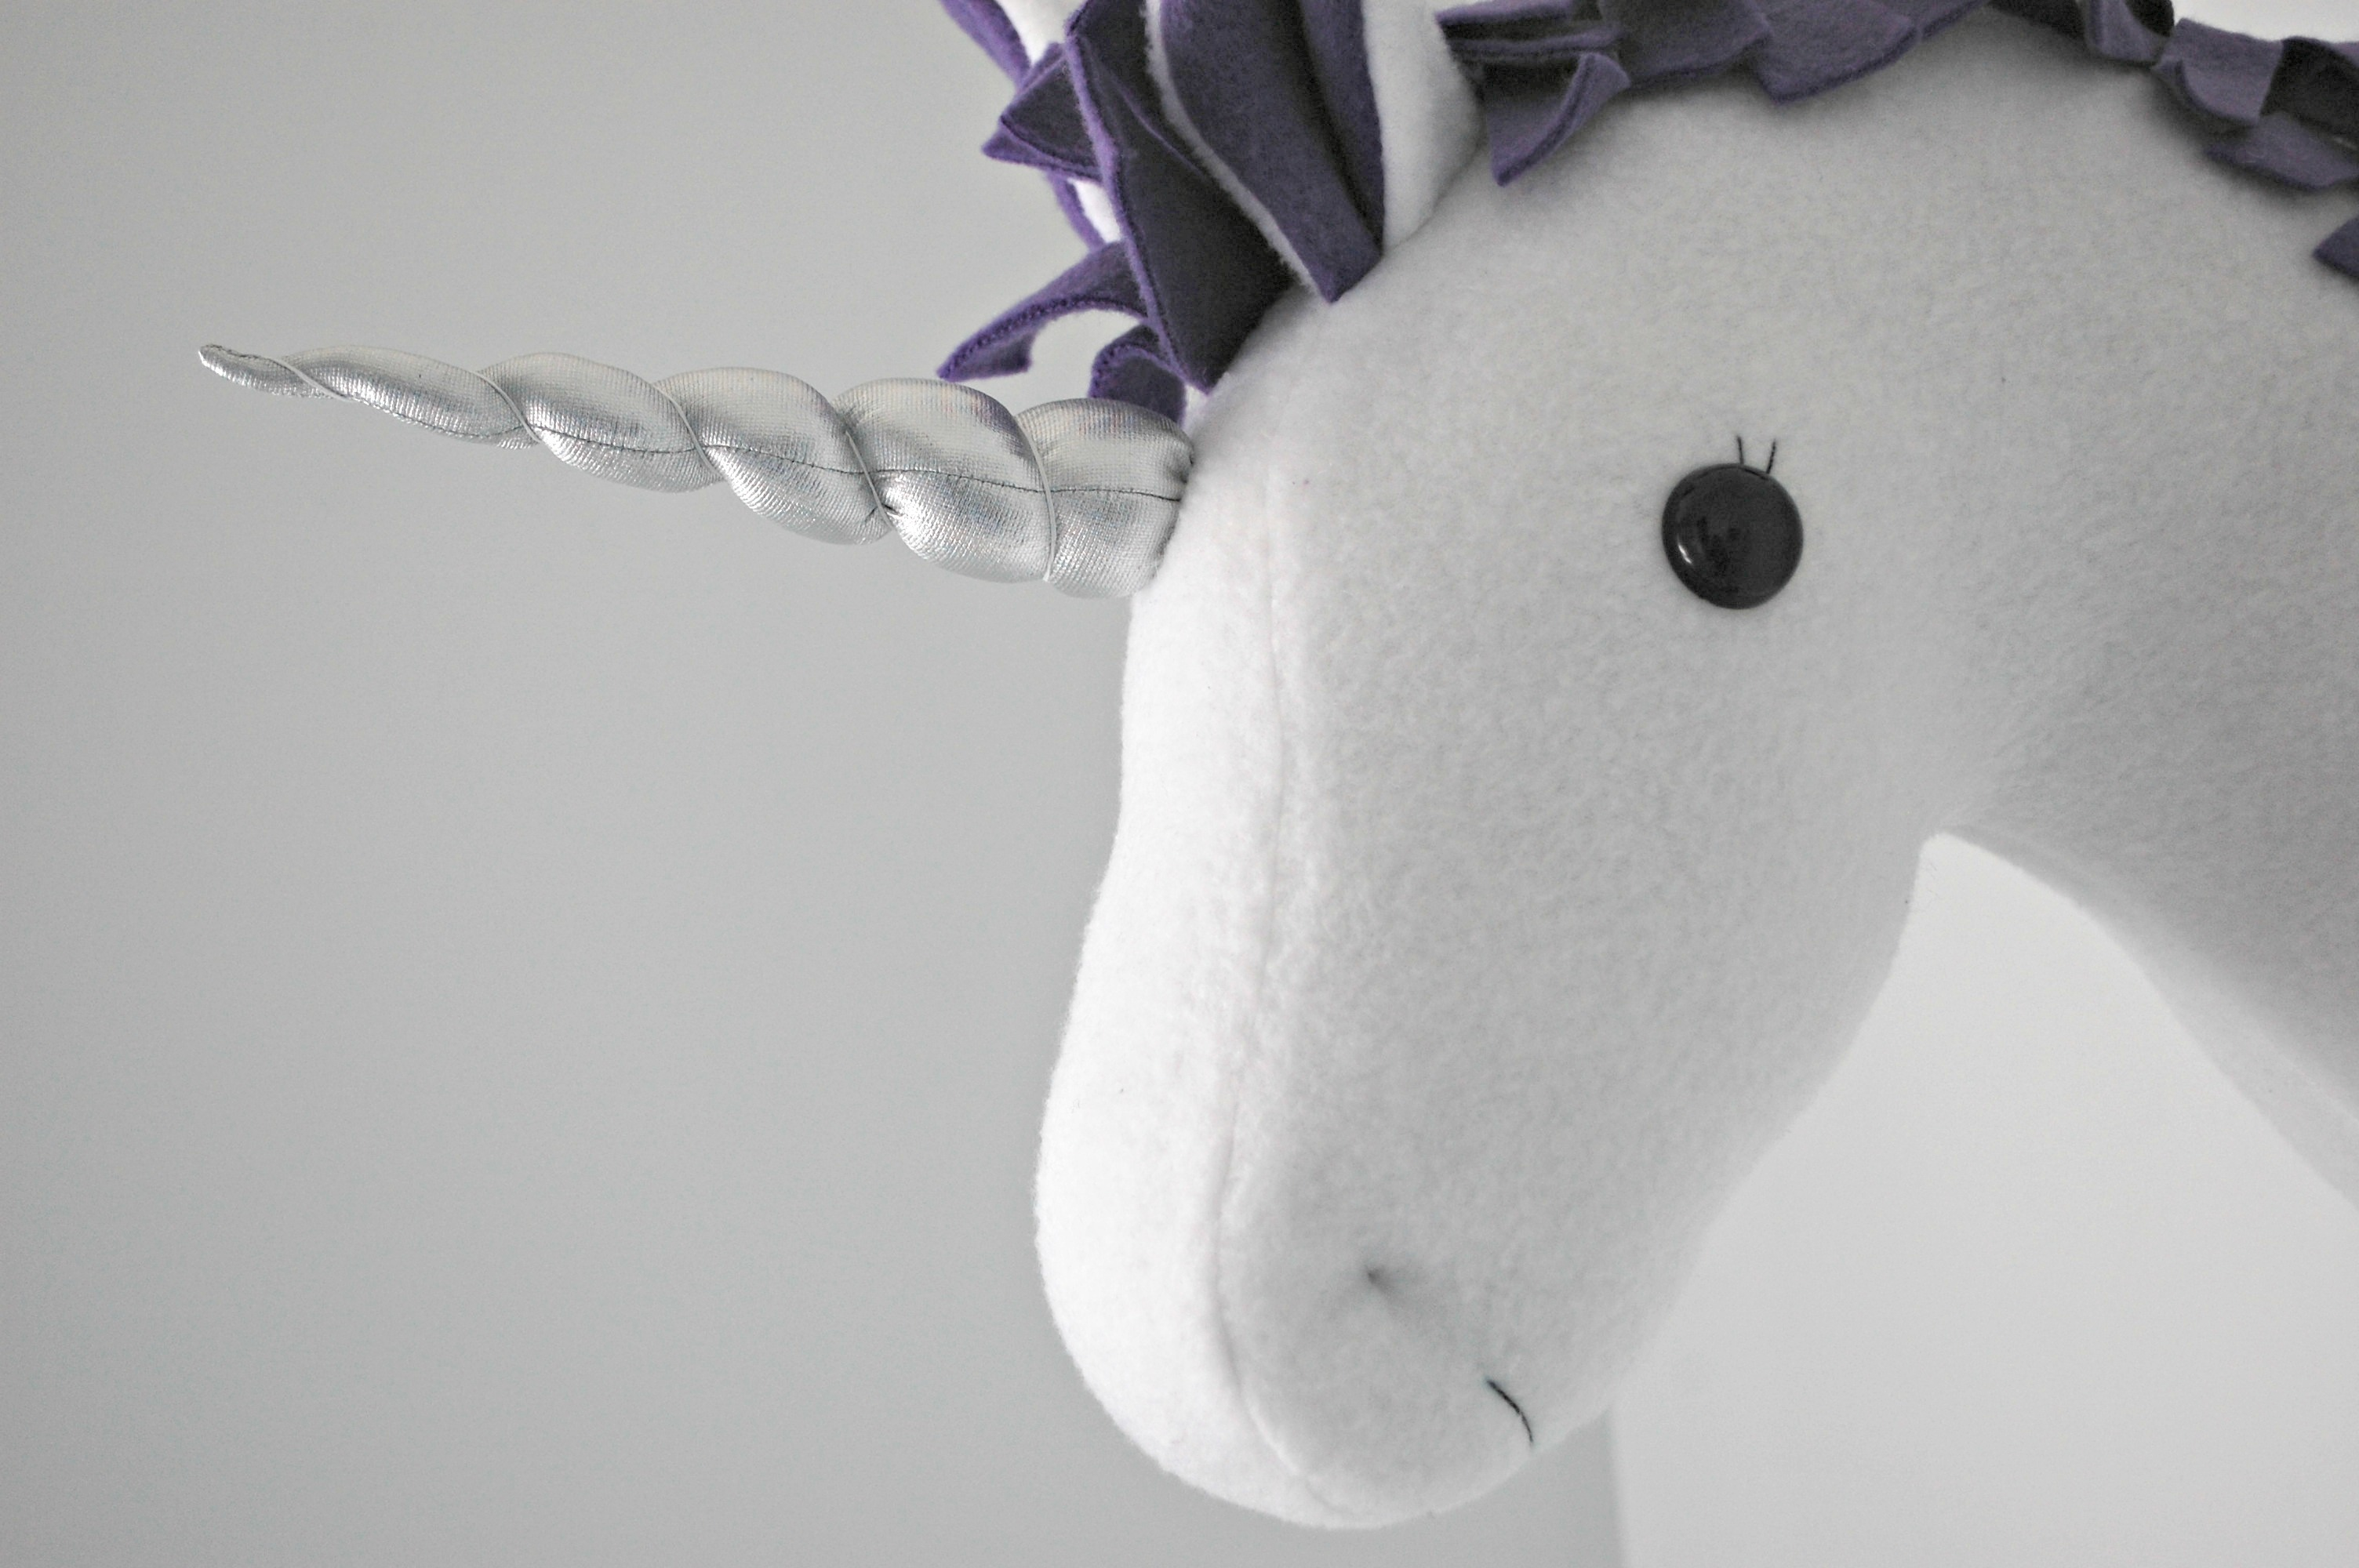 Coming Soon: Plush Taxidermy Patterns - whileshenaps.com